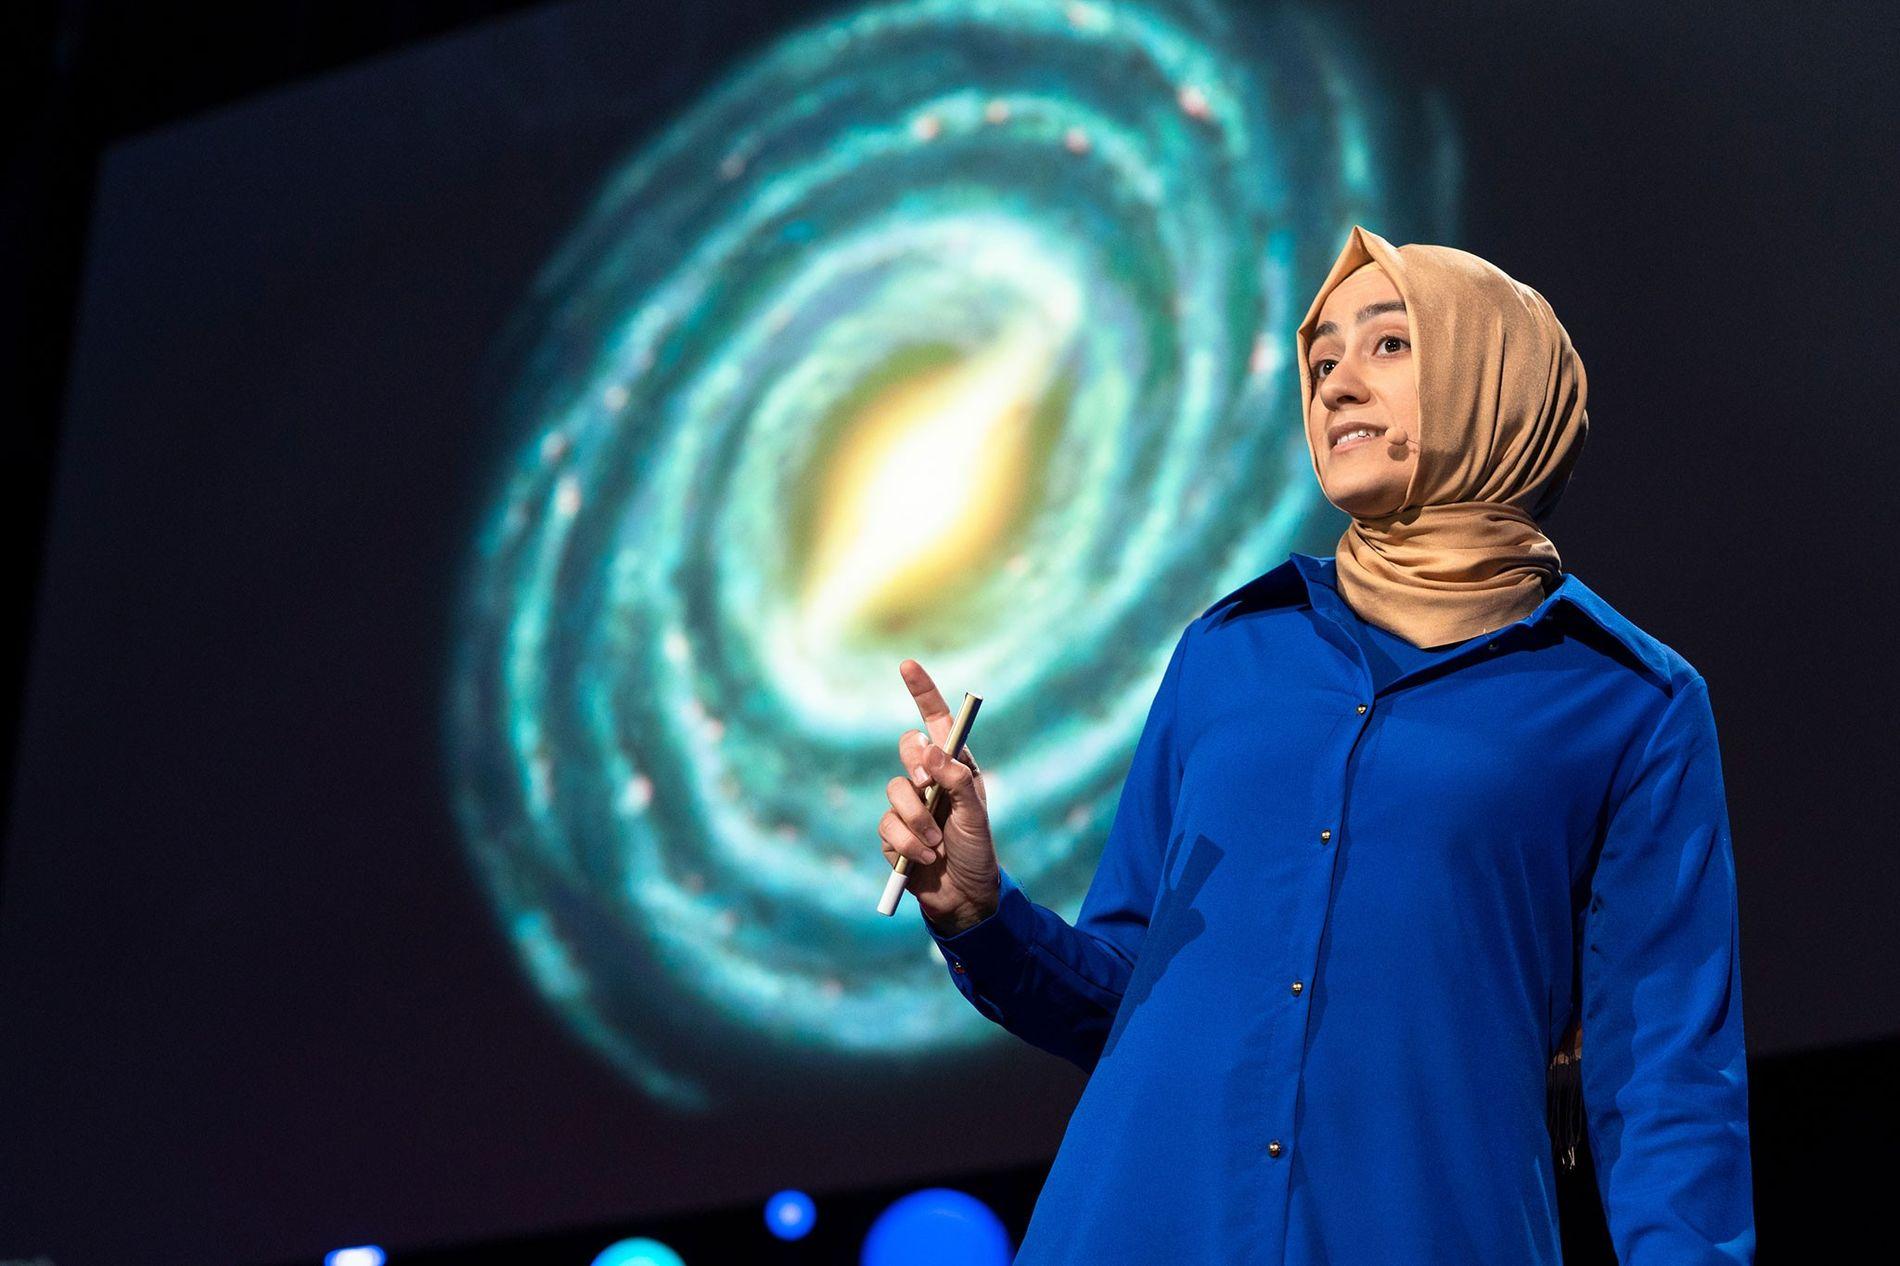 Astrophysicist Burçin Mutlu-Pakdil speaks during the TED2018 event in Vancouver, Canada.